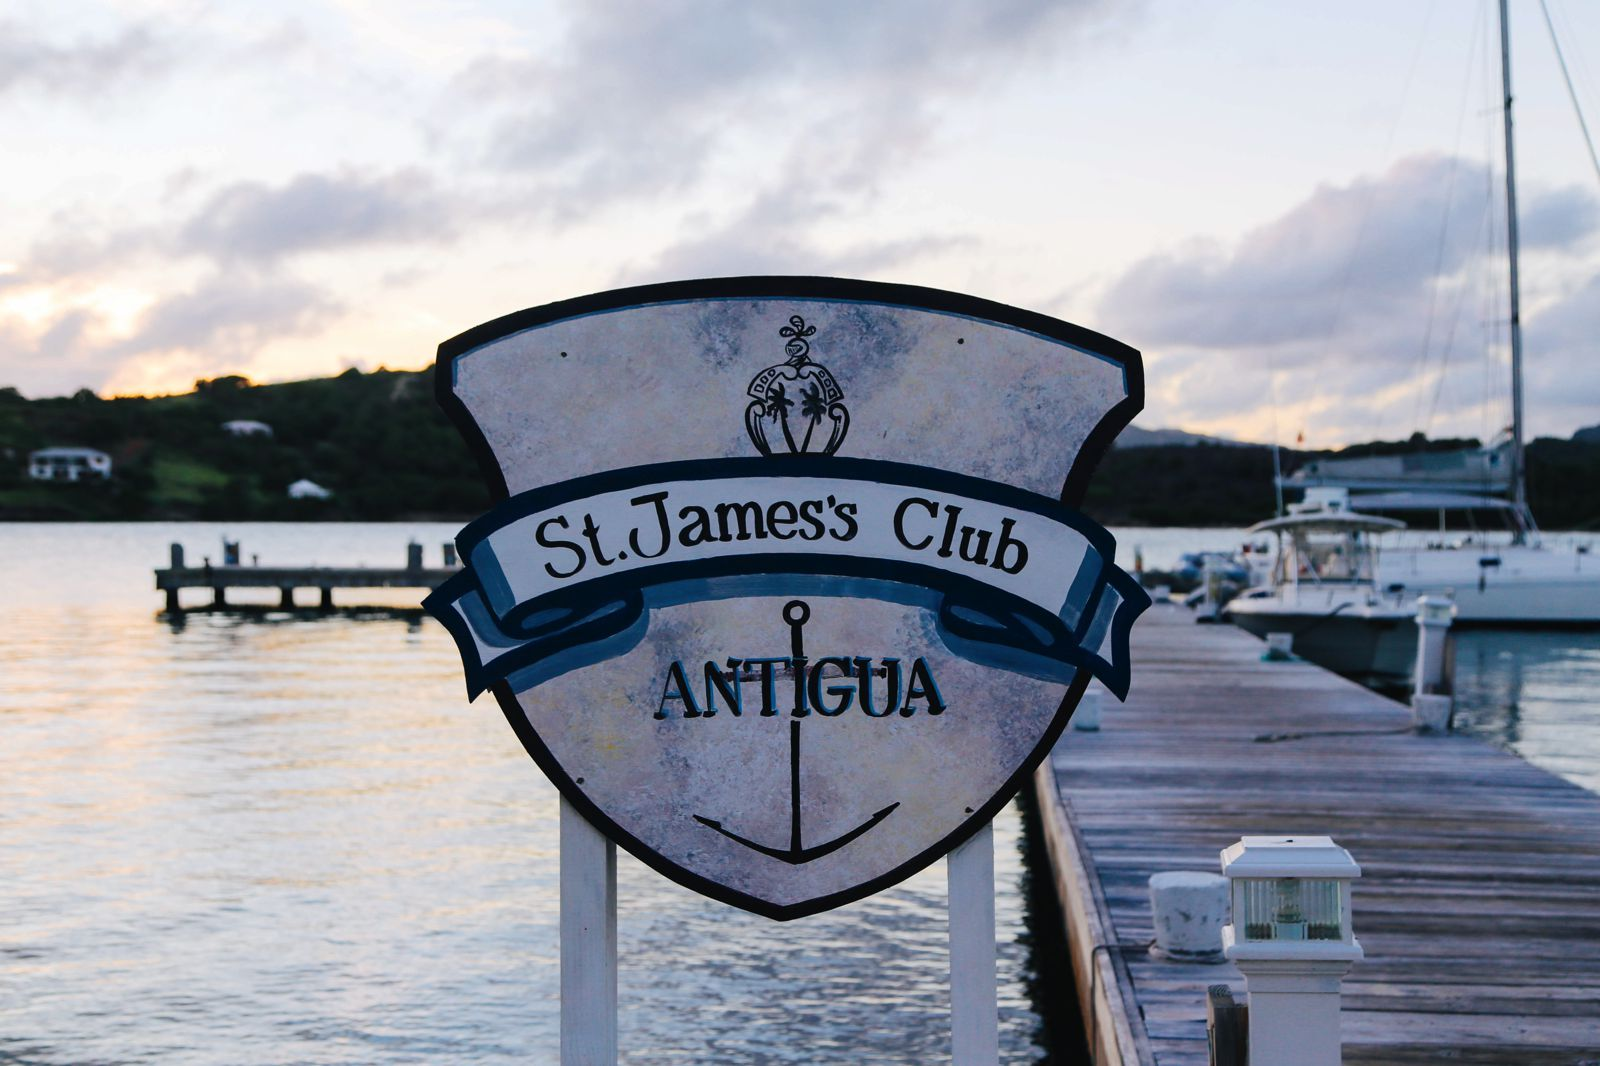 St James Club, Antigua (17)